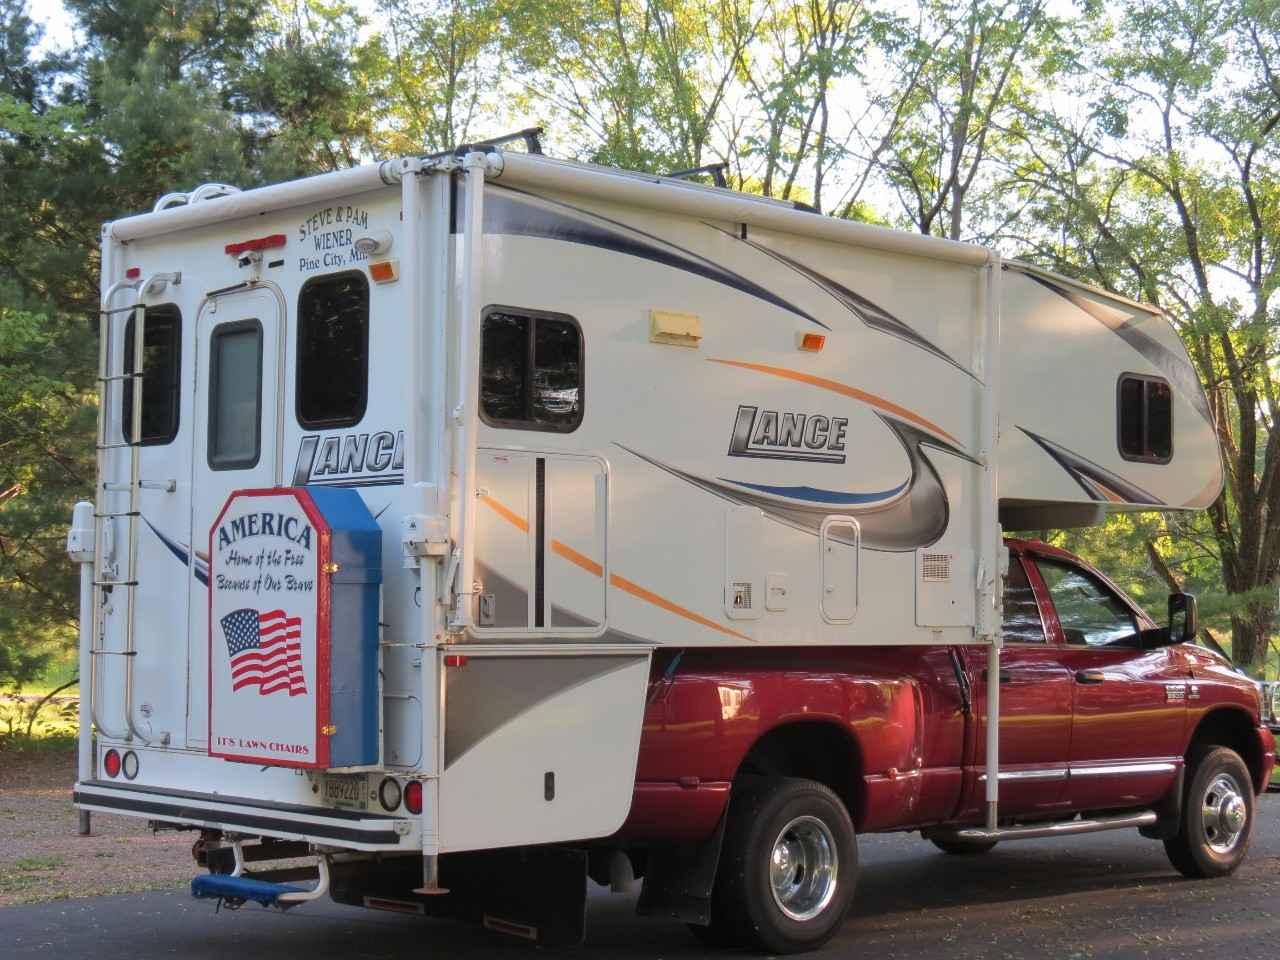 Dodge Dealers Mn >> 2010 Used Lance 1181 Truck Camper in Minnesota MN